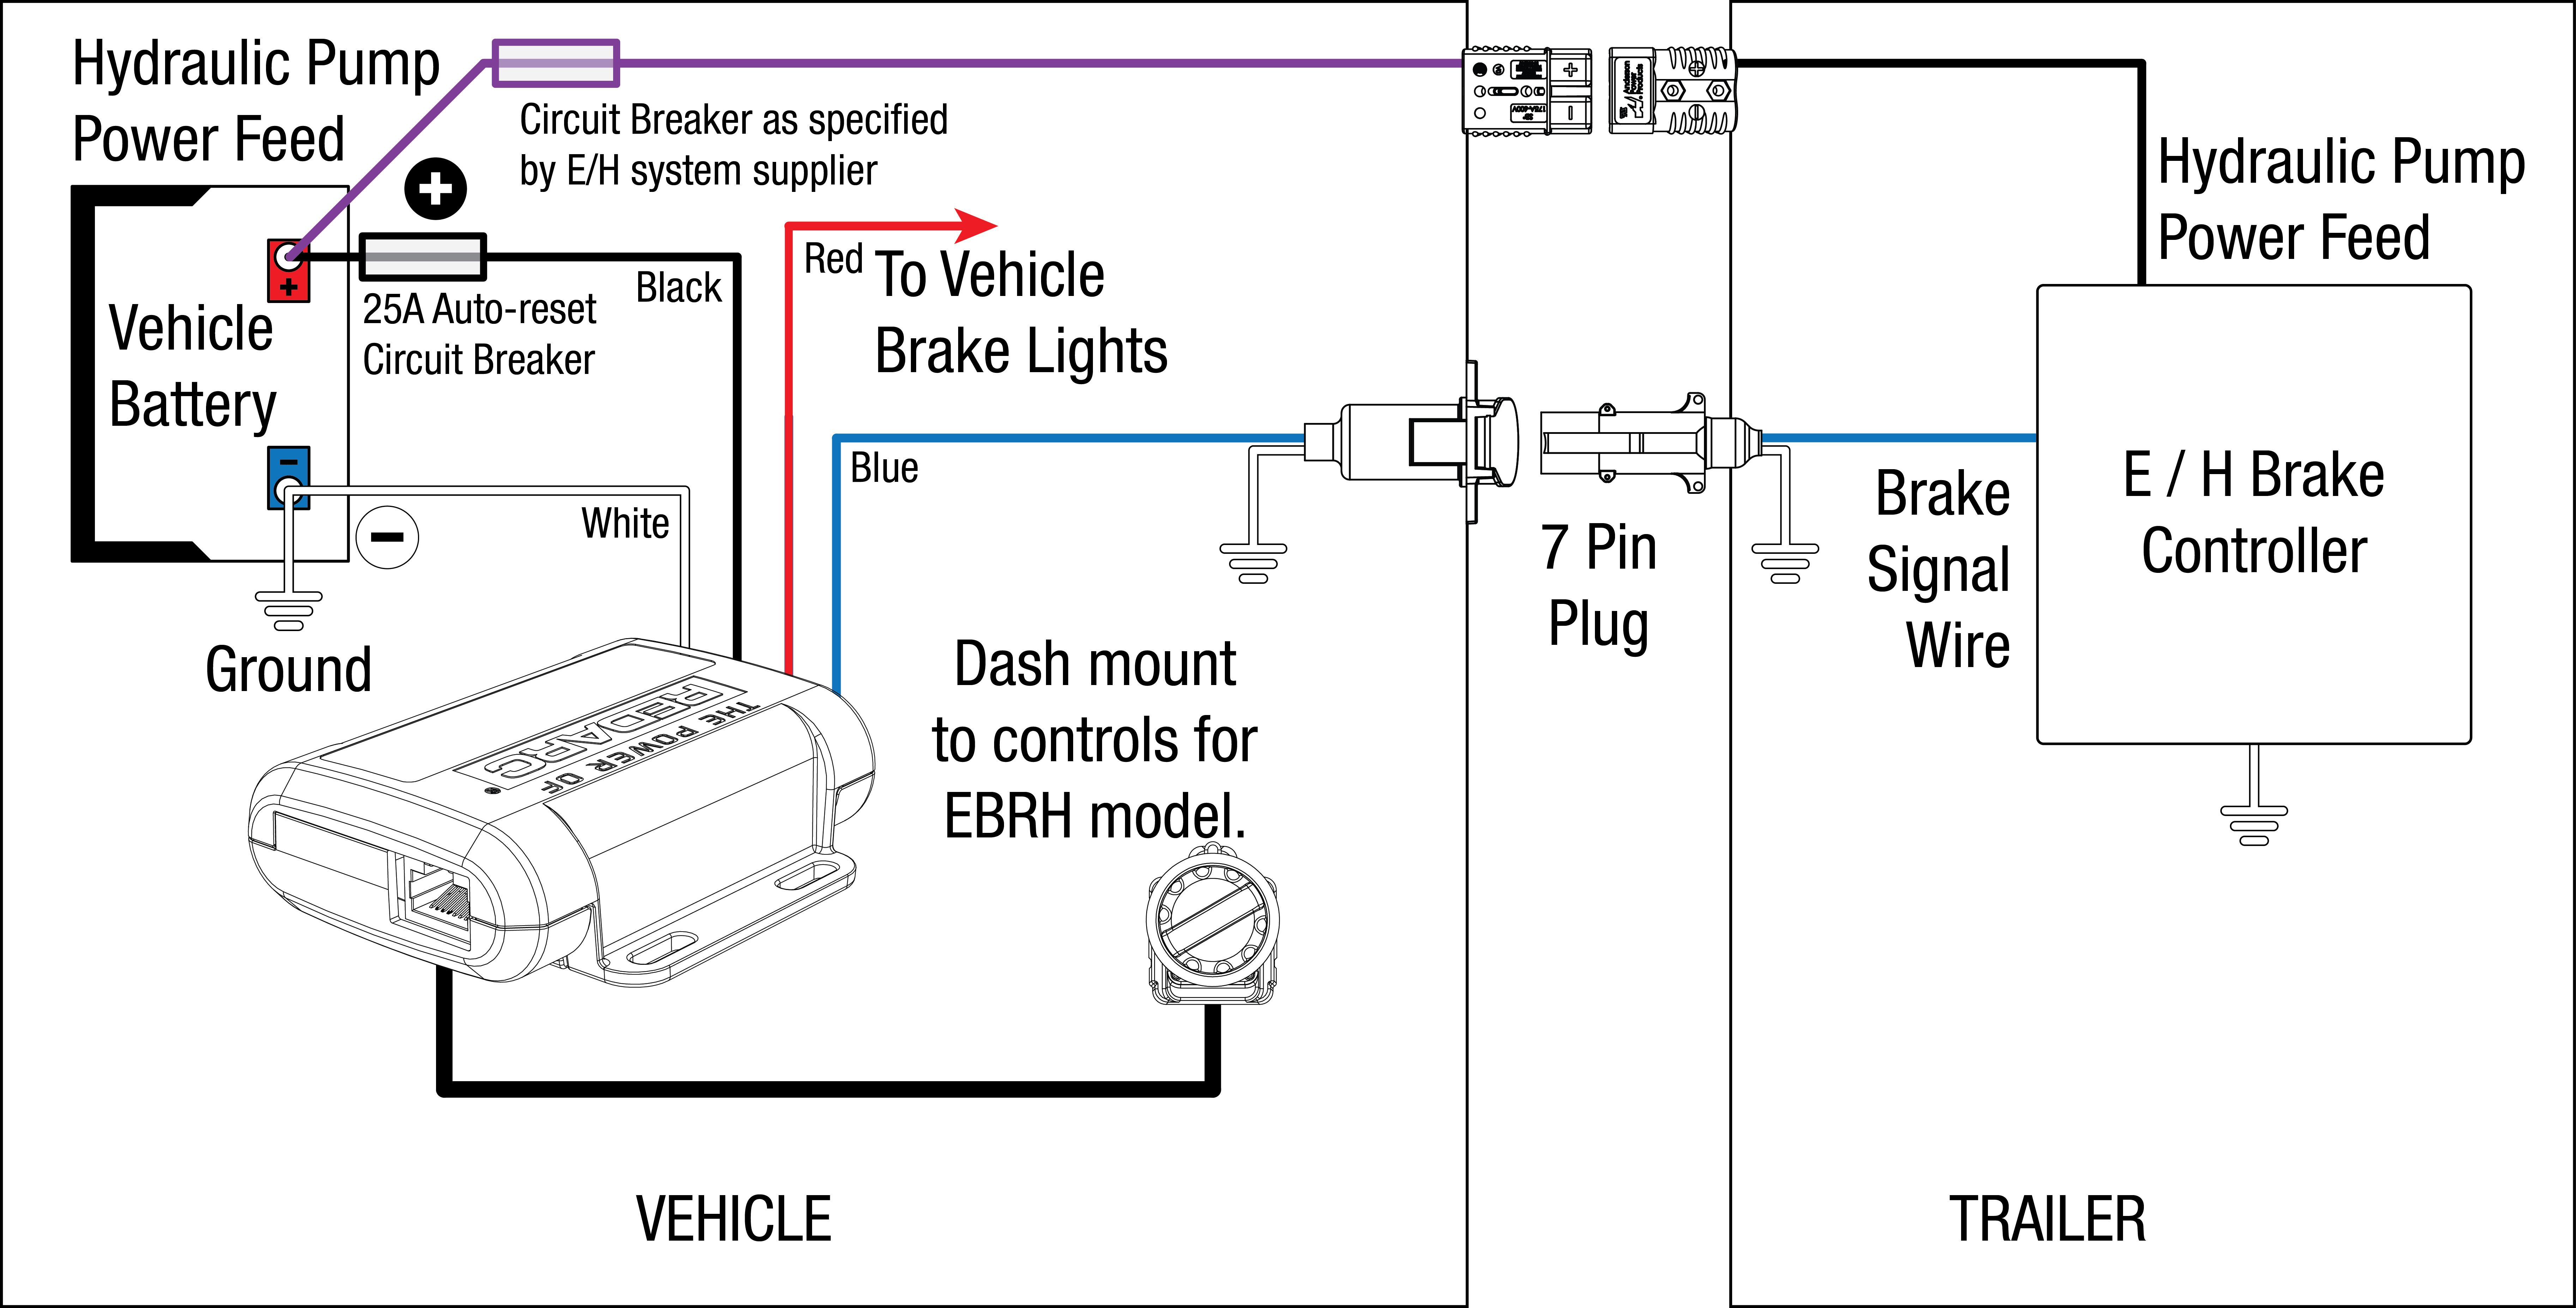 [DIAGRAM_38DE]  YH_3636] Wire Diagram Brake Controller Wiring Diagram | Ford Trailer Brake Controller Wiring Diagram |  | Eumqu Embo Vish Ungo Sapebe Mohammedshrine Librar Wiring 101